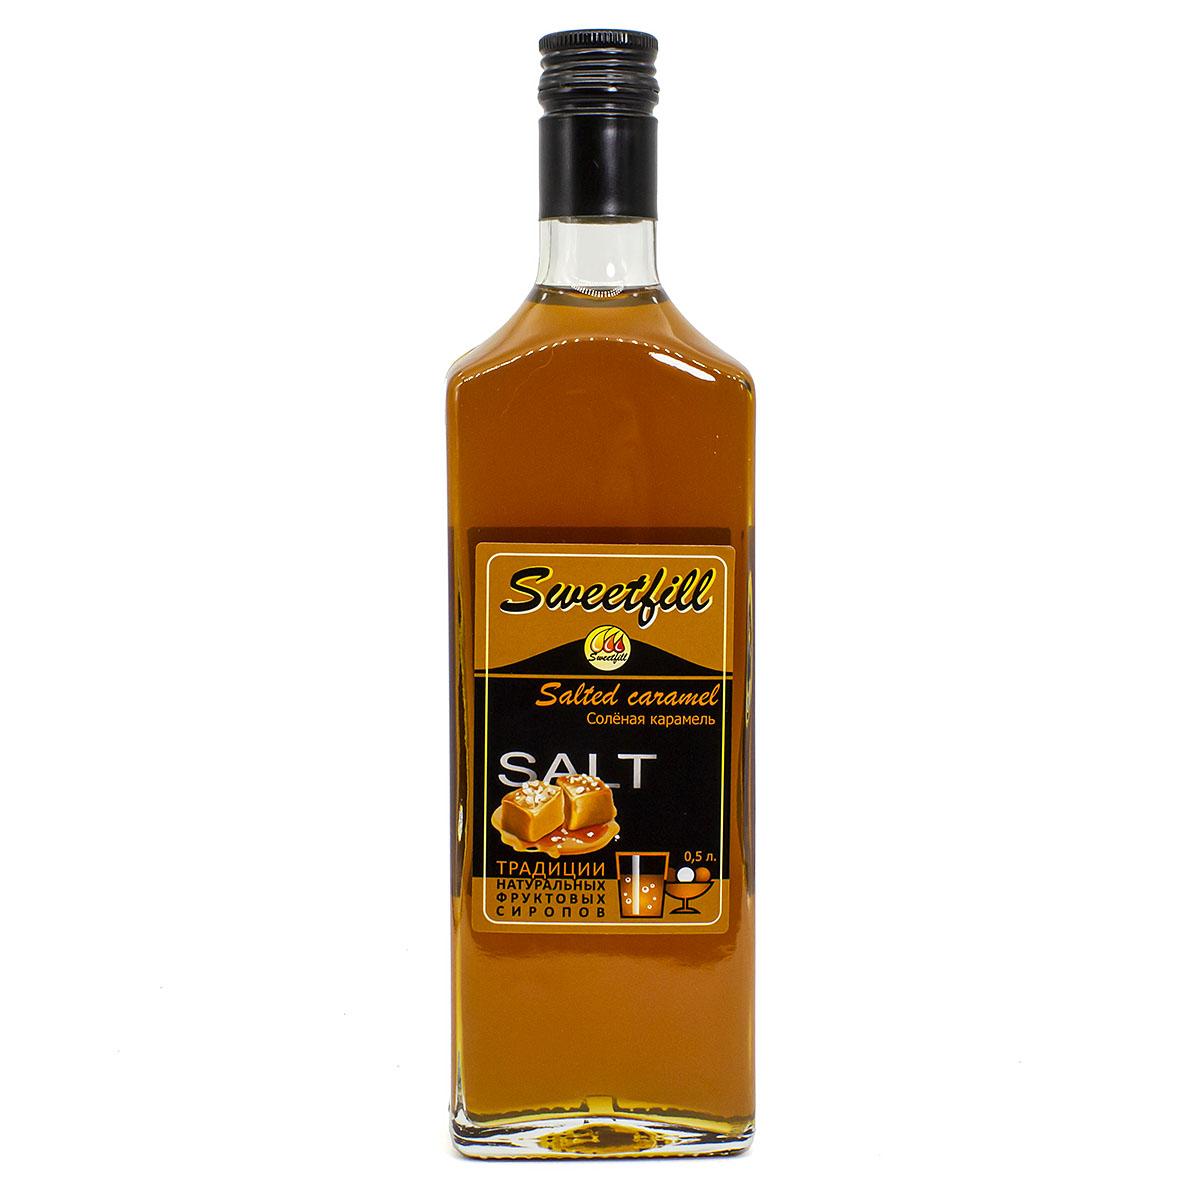 Сироп Sweetfill Соленая карамель, 0,5 л vedrenne карамель сироп 0 7 л